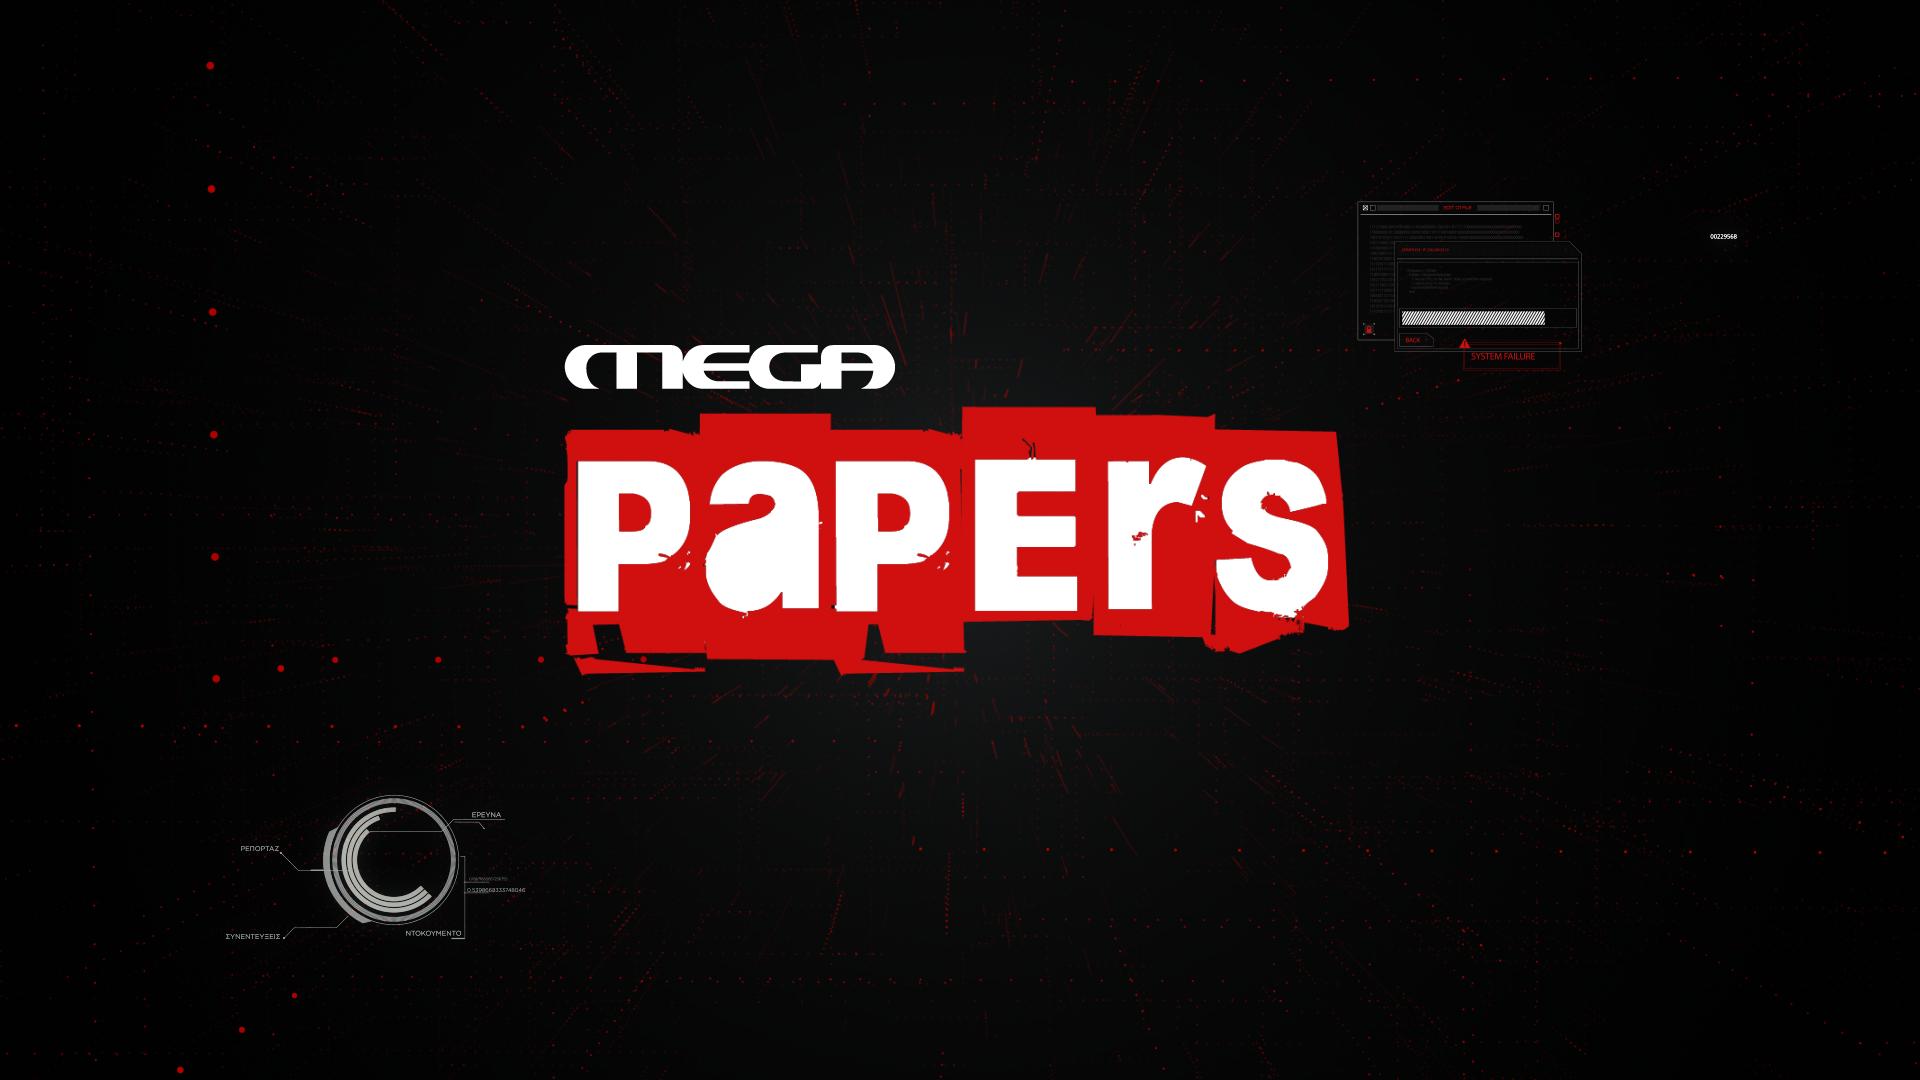 MEGA PAPERS